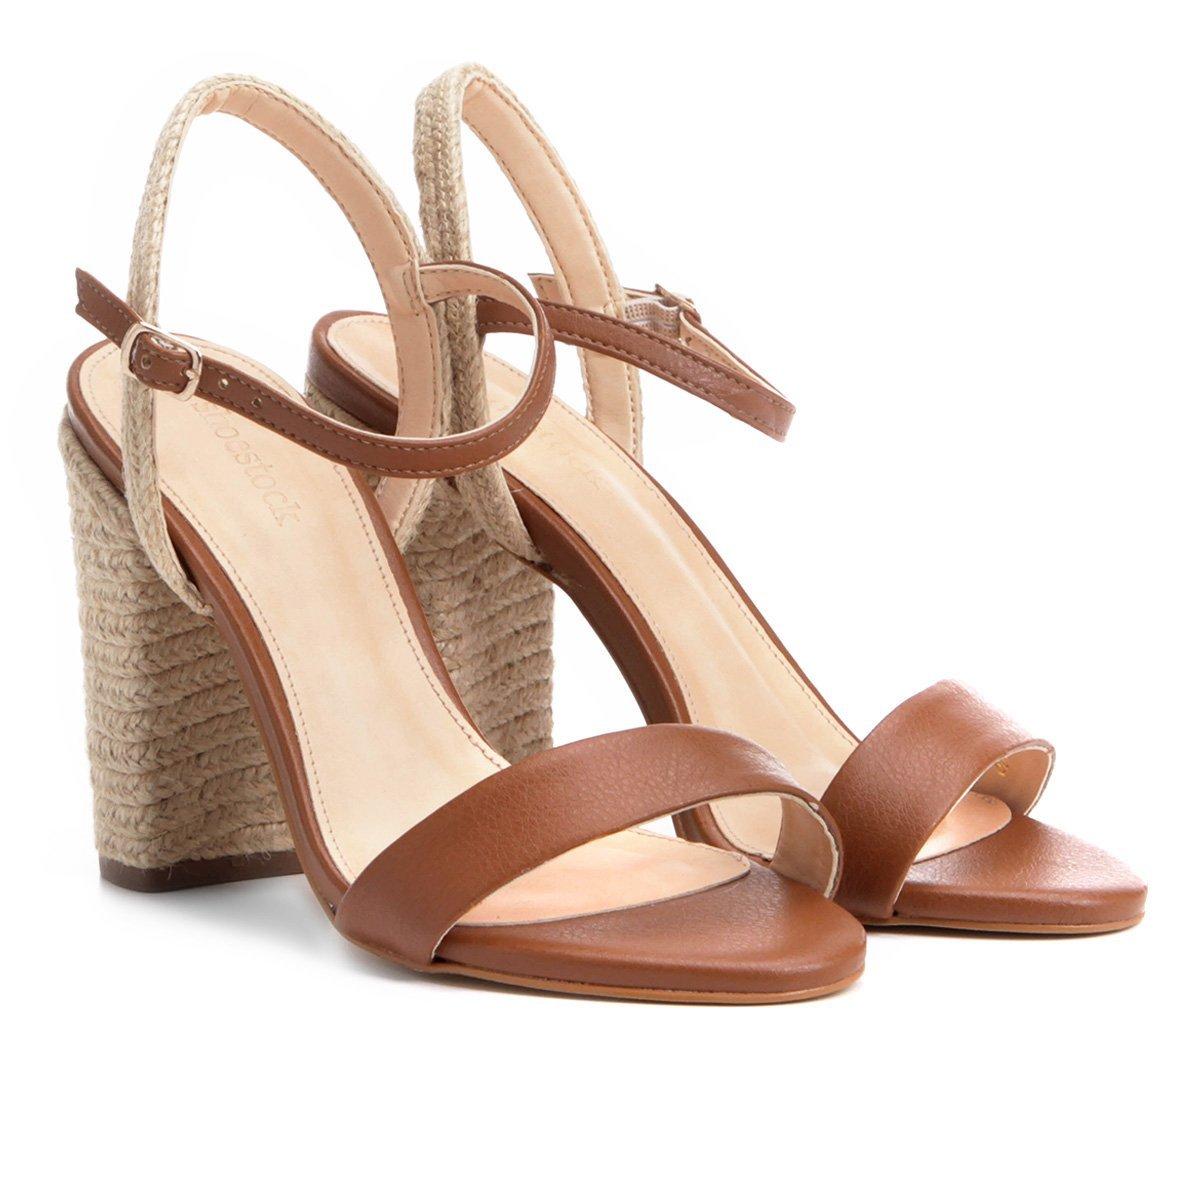 Feminina Corda Shoestock Sandália Salto Sandália Corda Grosso Salto Shoestock Caramelo Grosso q6RwnCH